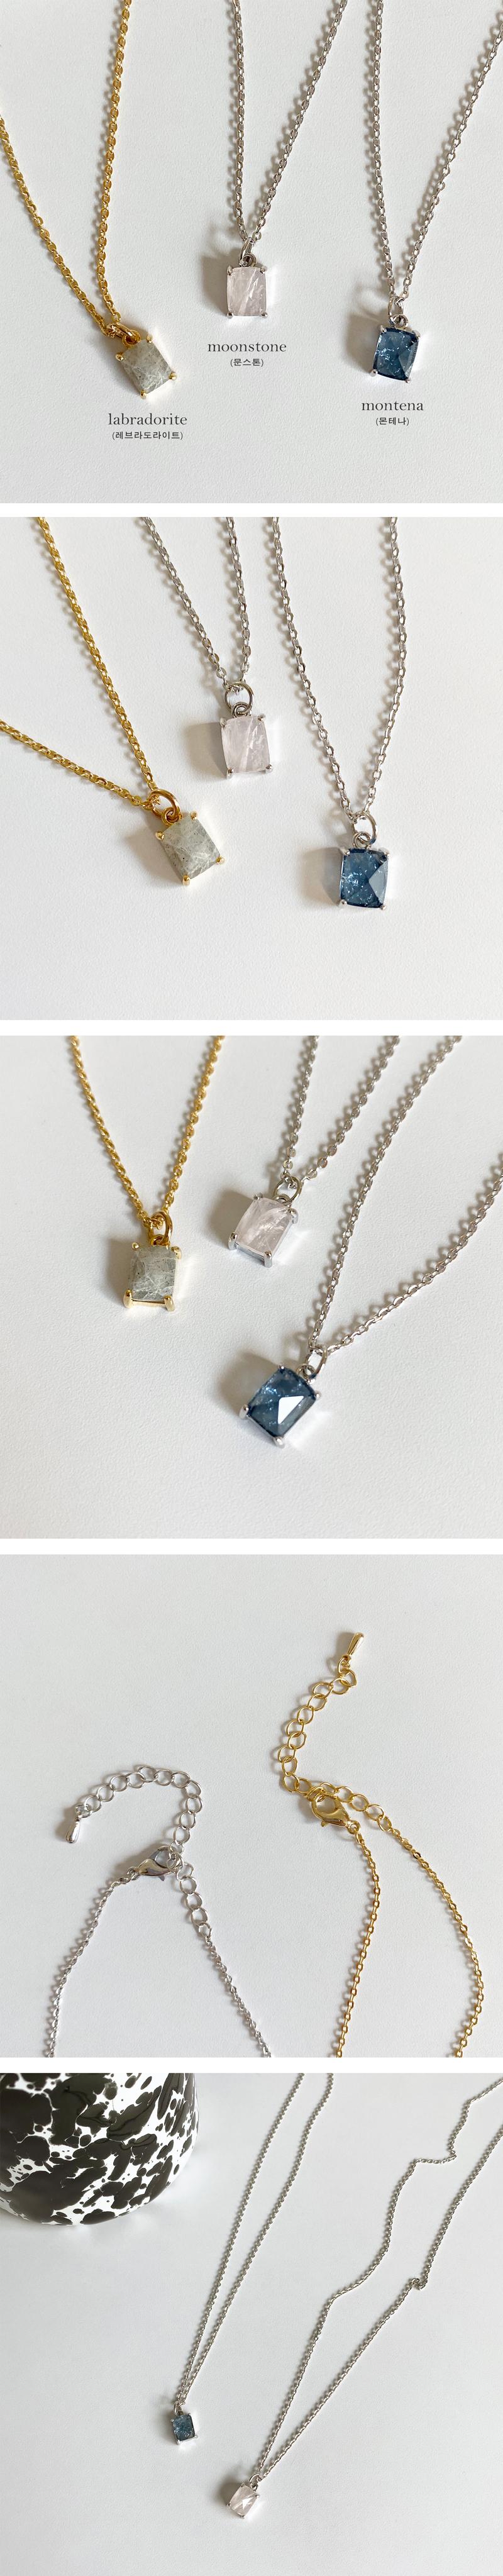 native rock necklace